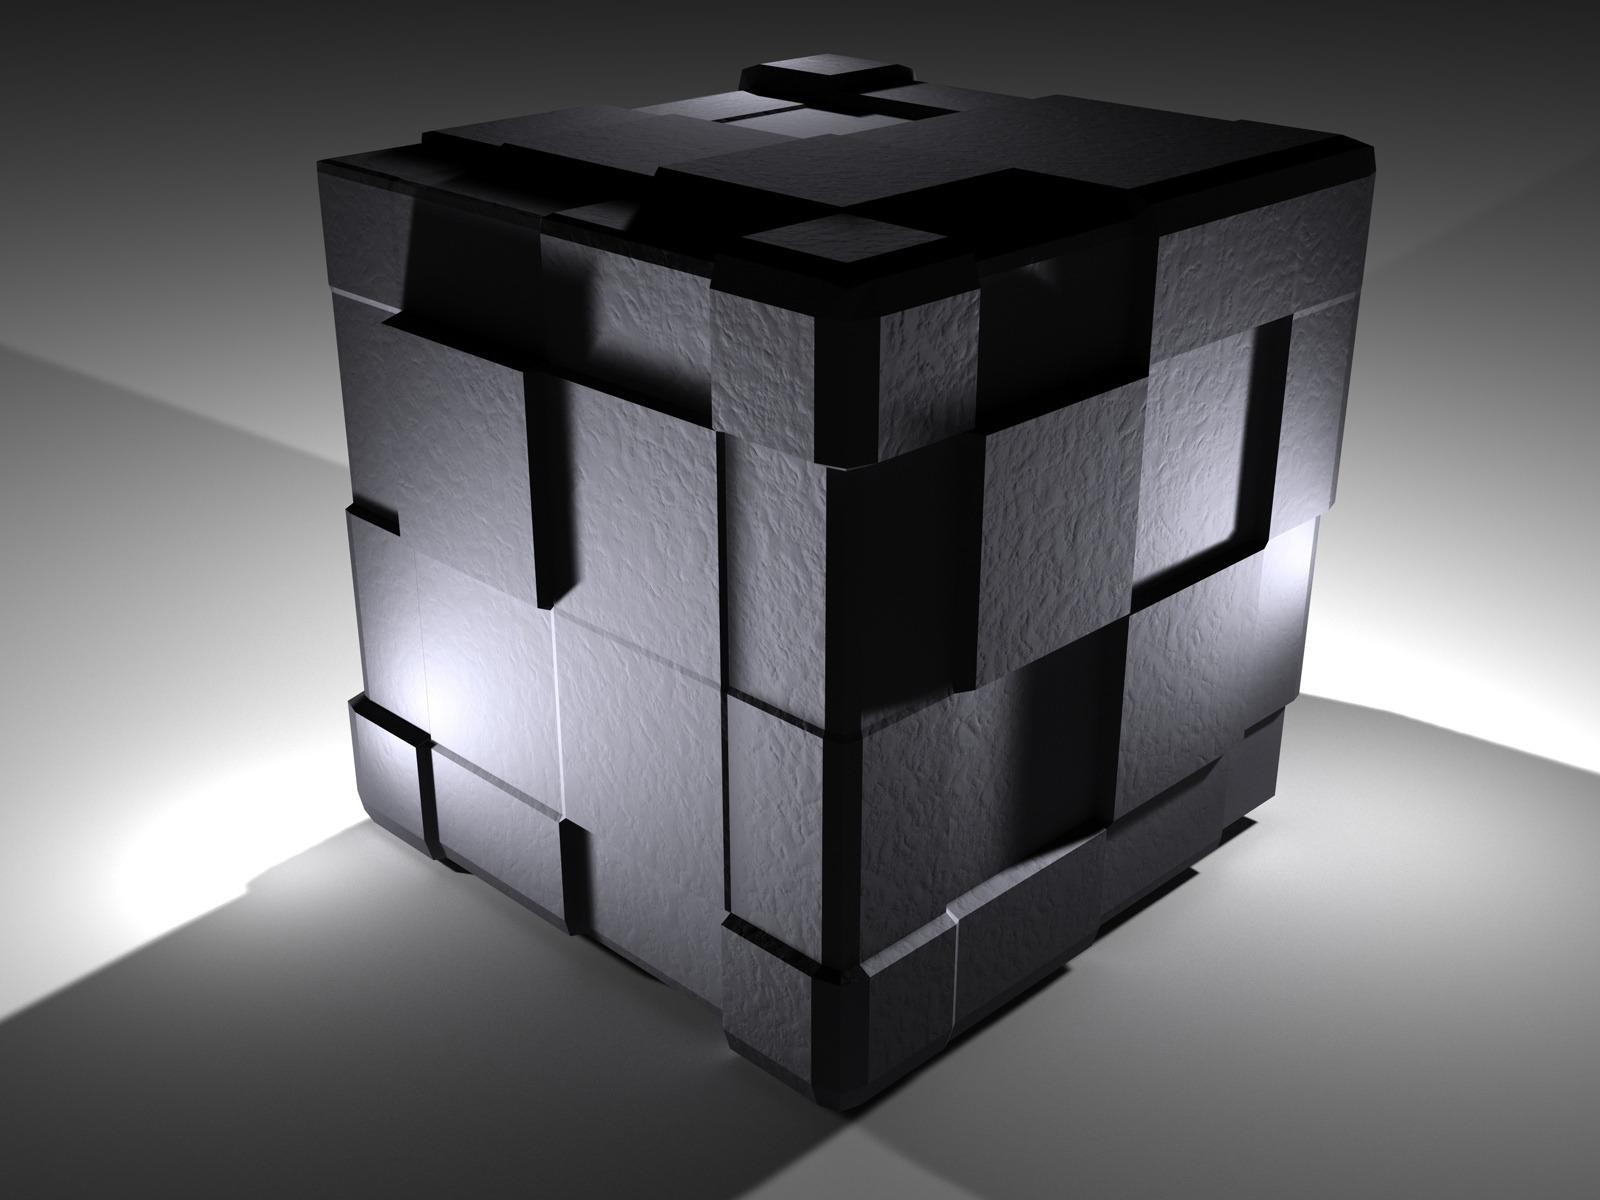 Cube 3d 1600x1200 1600x1200